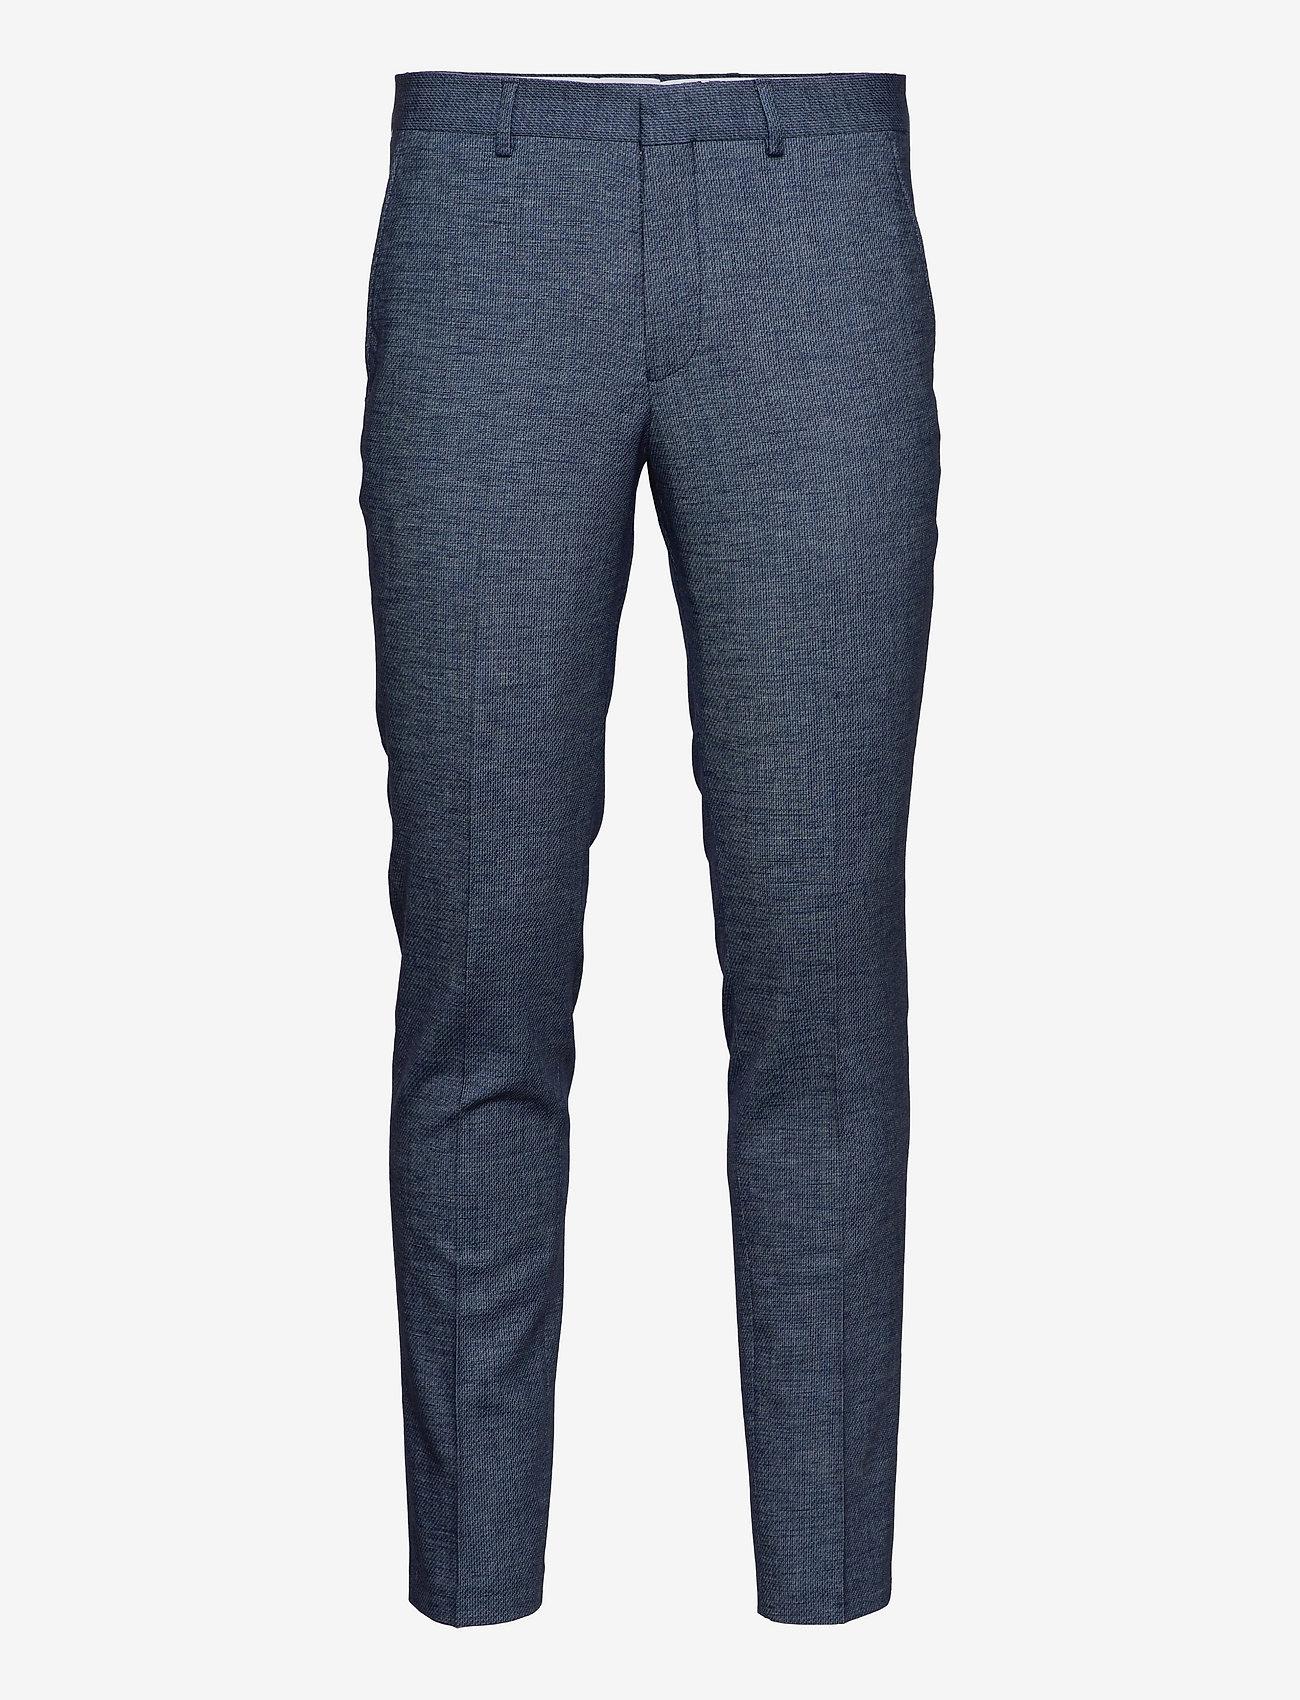 Selected Homme - SLHSLIM-RORYBILL DK BLUE TWILL TRS B - slim jeans - dark blue - 0